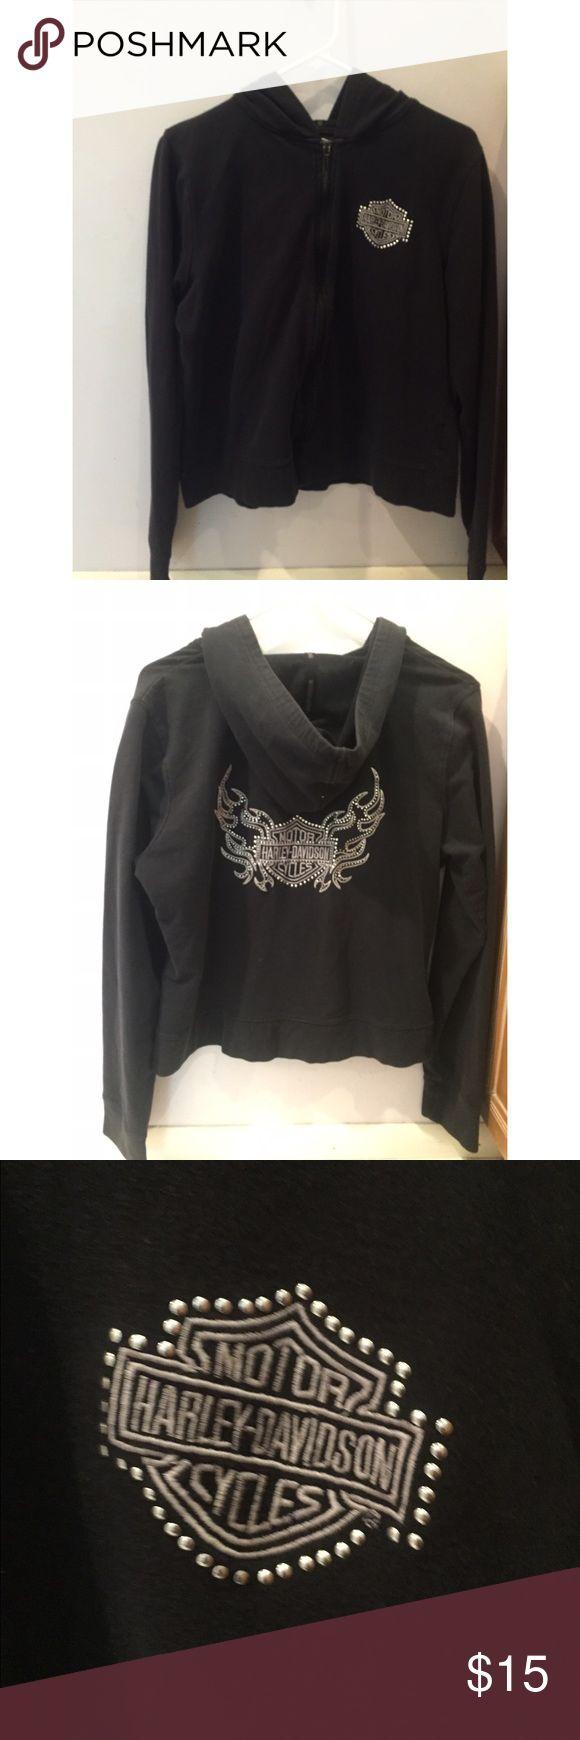 Harley Davidson Sweatshirt Perfect condition, women's studded sweatshirt. Runs small, fits way more like a large!! Harley-Davidson Sweaters